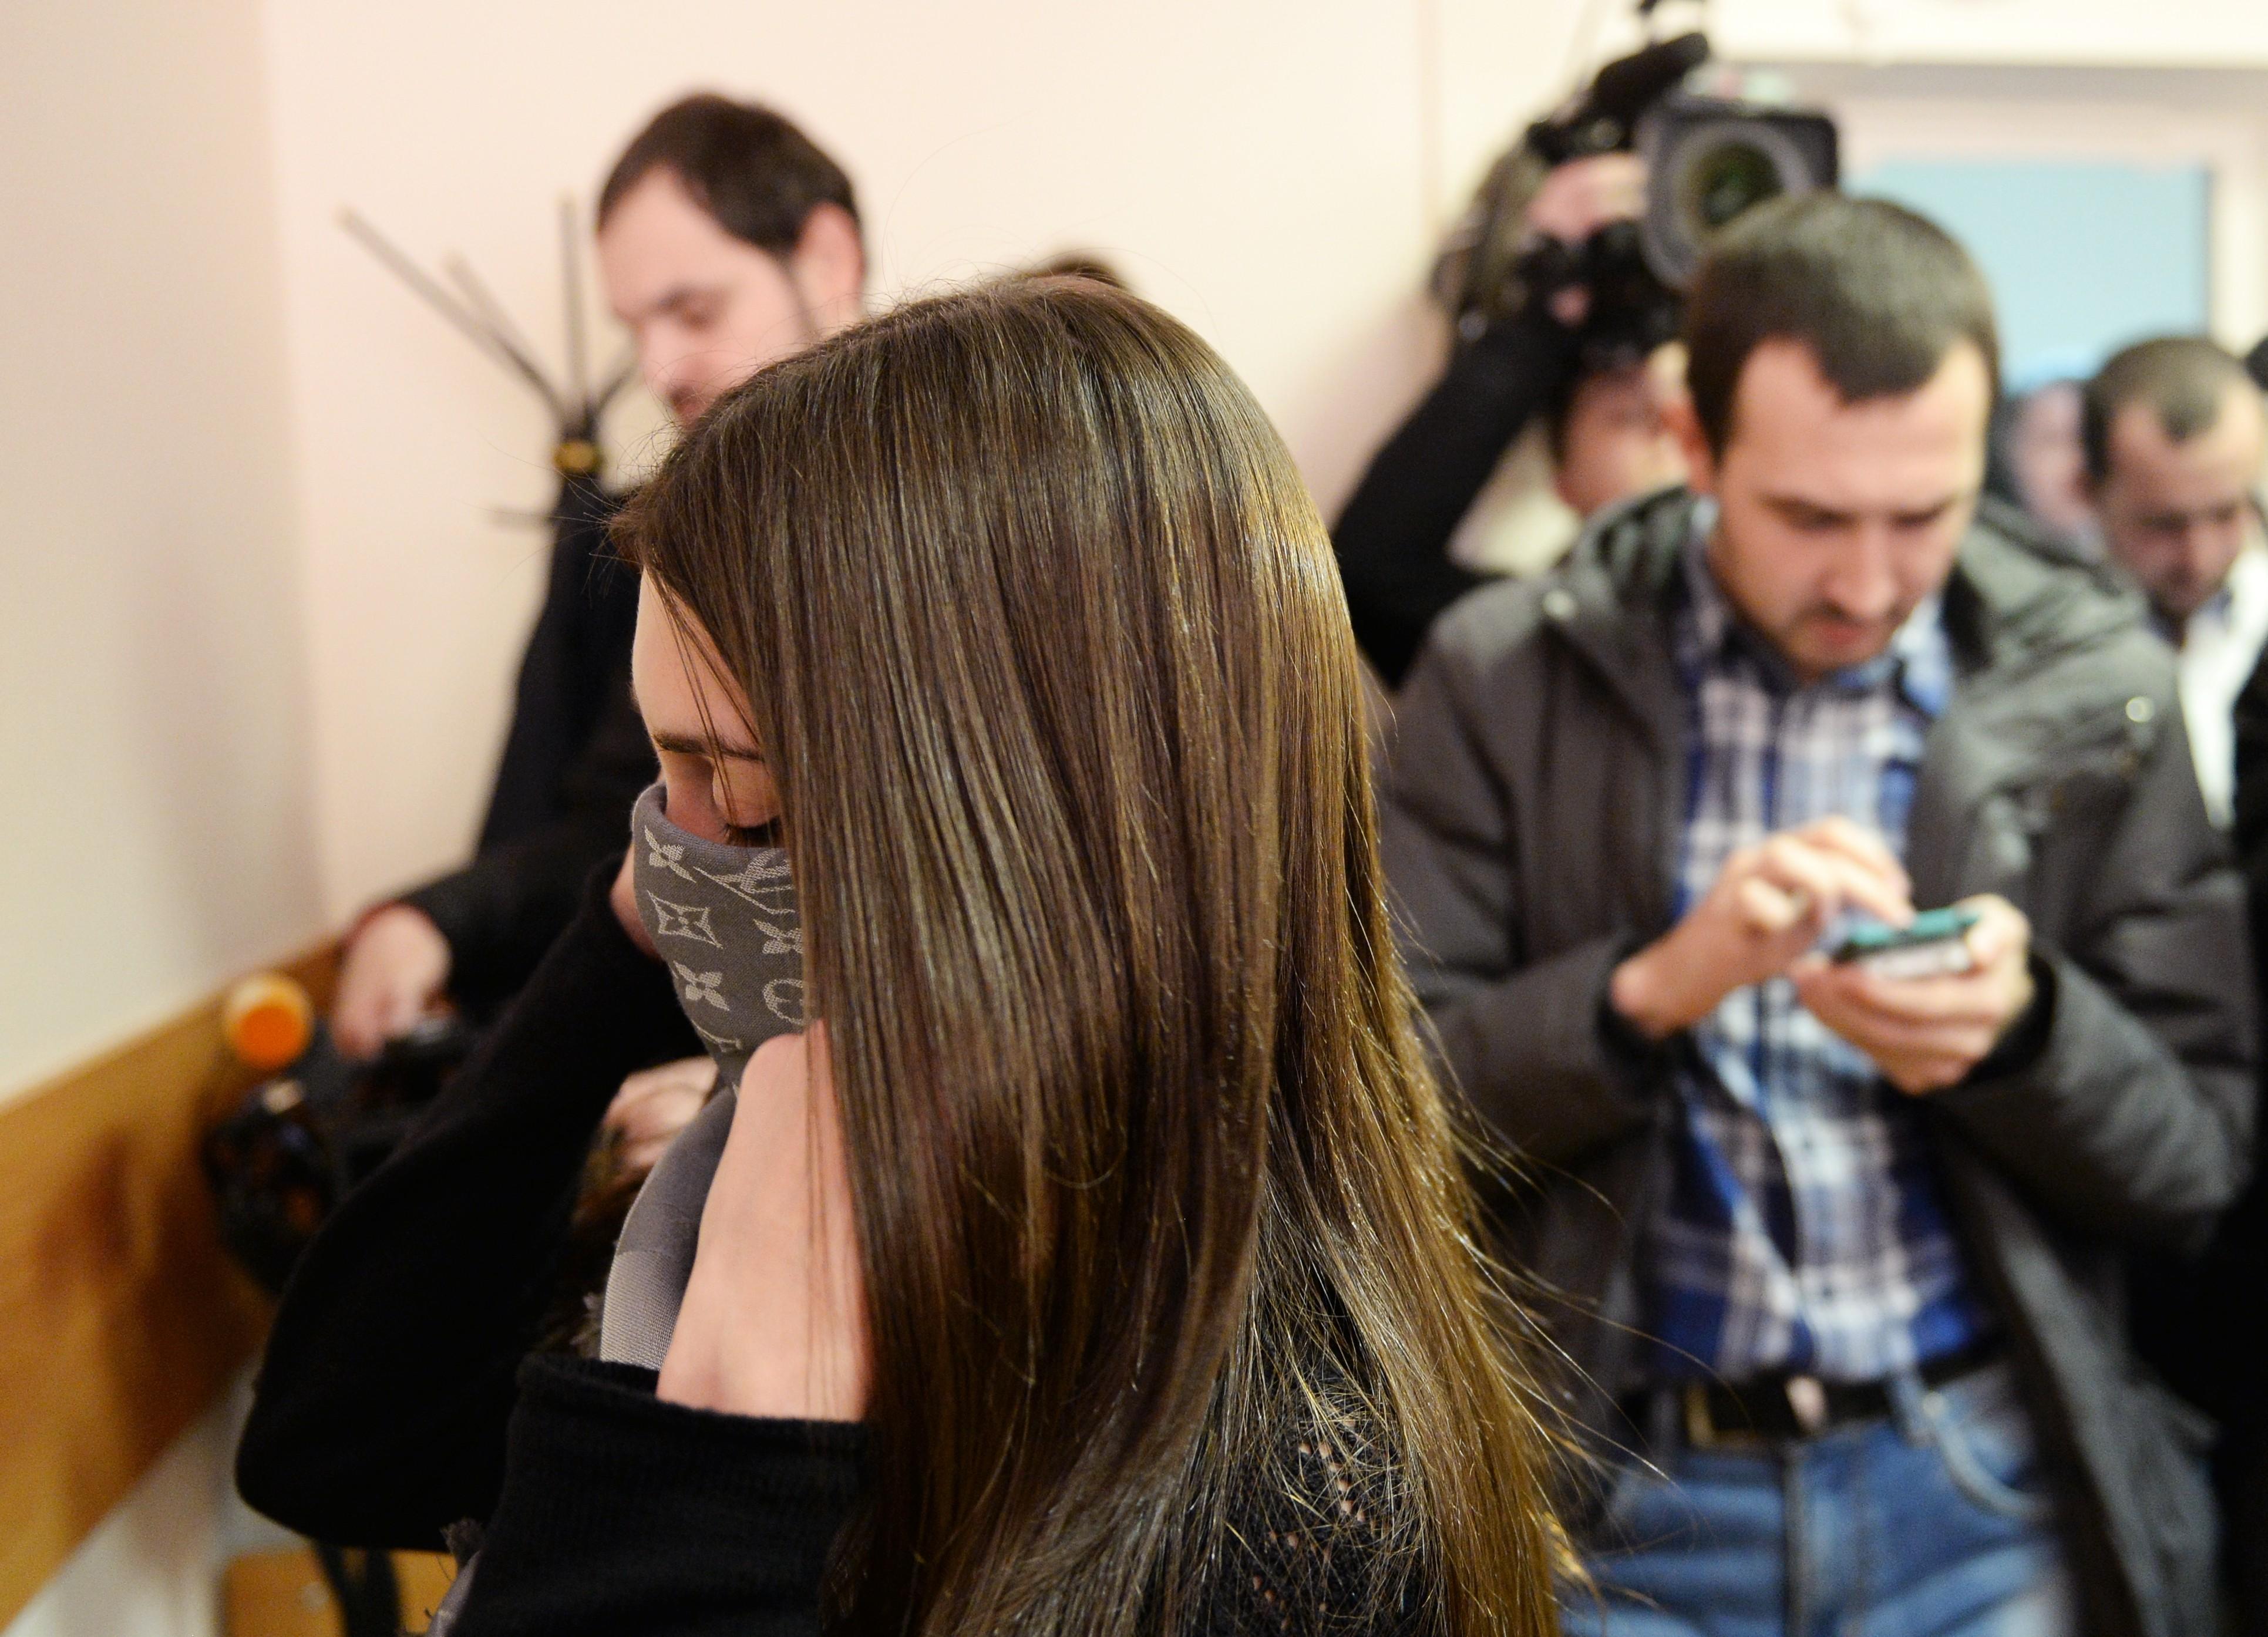 <p>Фото: &copy; РИА Новости/Валерий Мельников</p>